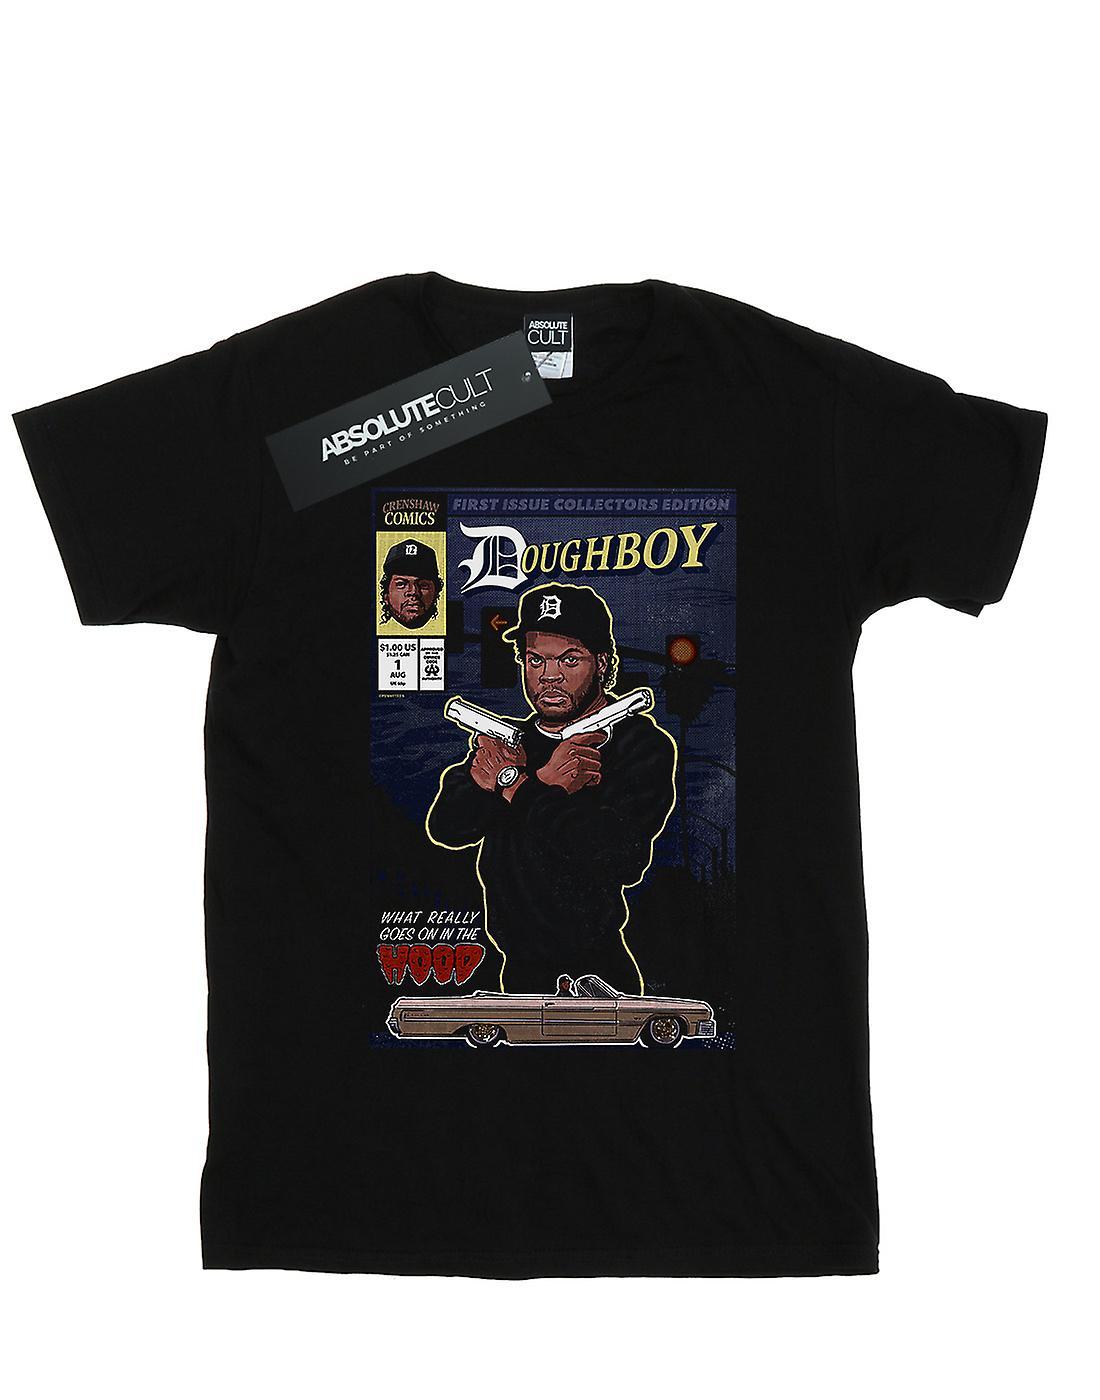 Pennytees Men's Doughboy Comics T-Shirt